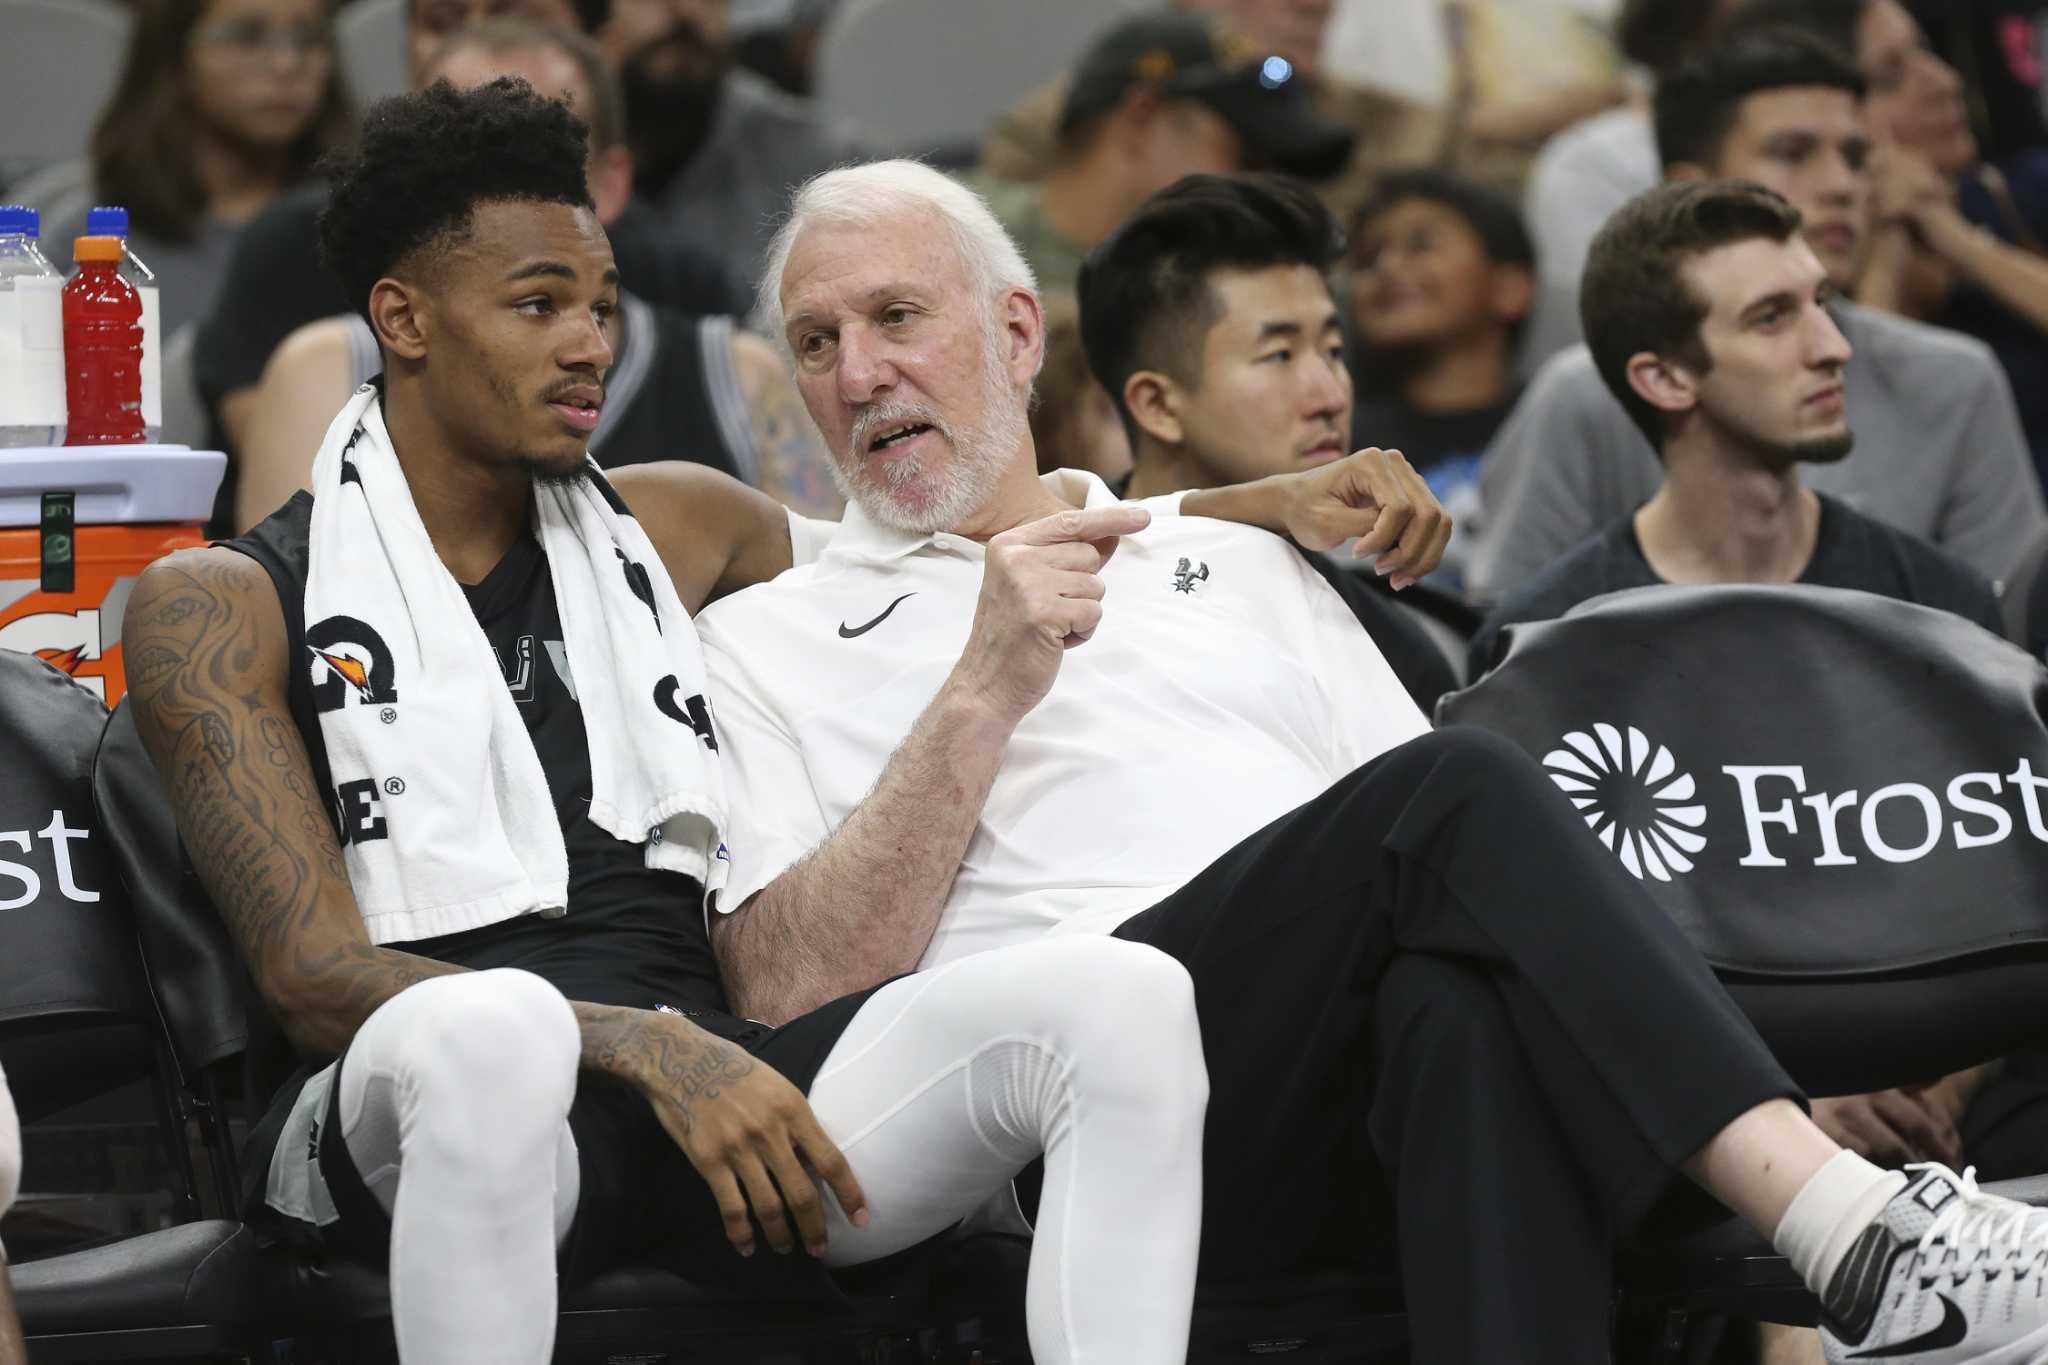 Background checks big part of NBA draft process